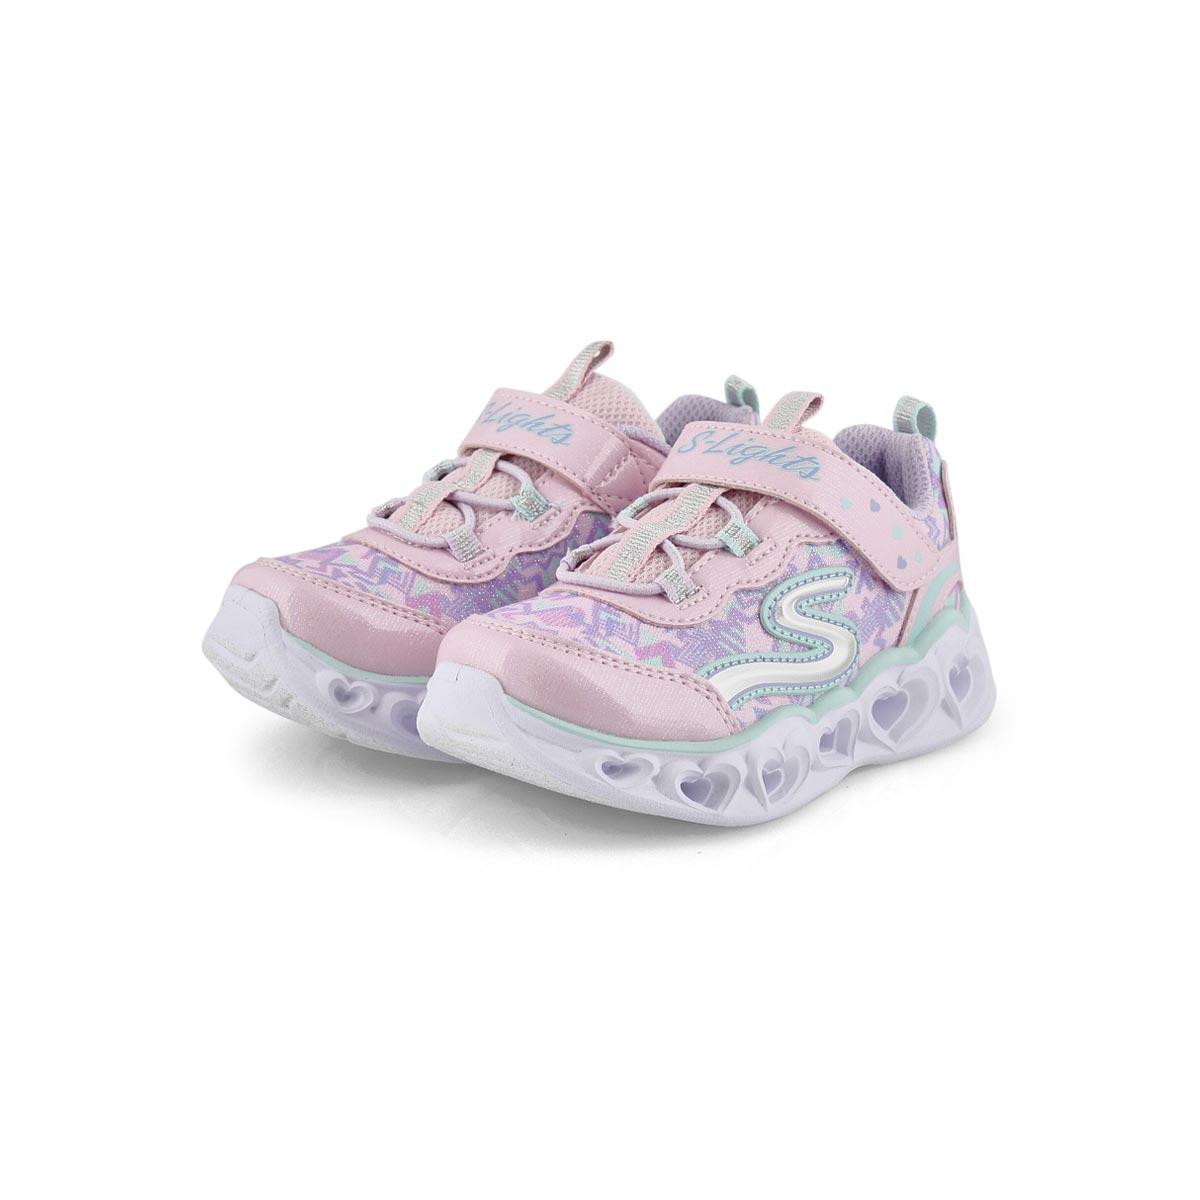 Infs-g Heart Lights pnk/multi sneakers